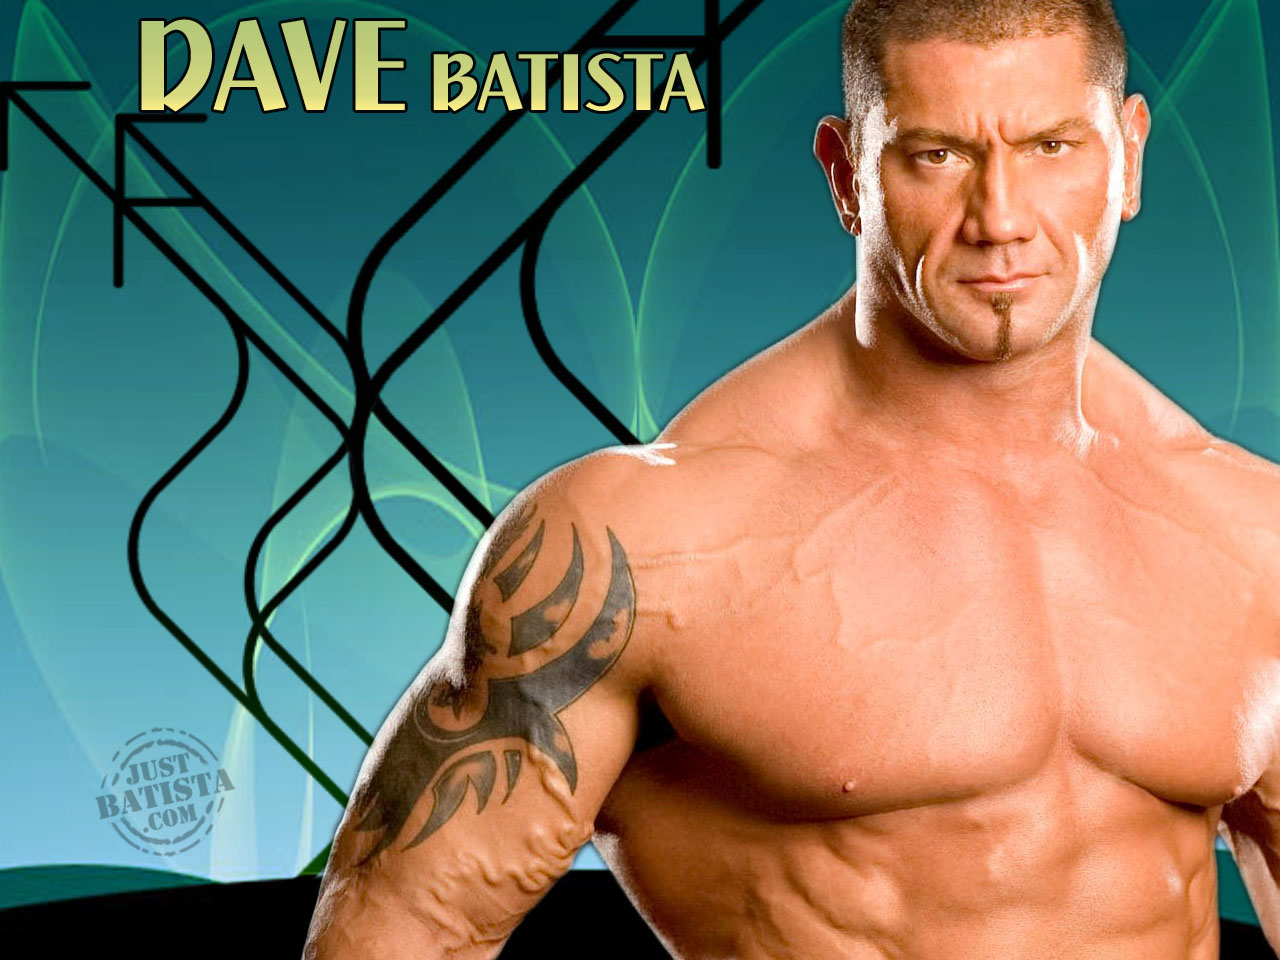 http://4.bp.blogspot.com/-Tx2EO3U-XcQ/Tb-3l1YapHI/AAAAAAAACWM/6zzFwIQfY9w/s1600/Batista-Wallpaper-5.jpg